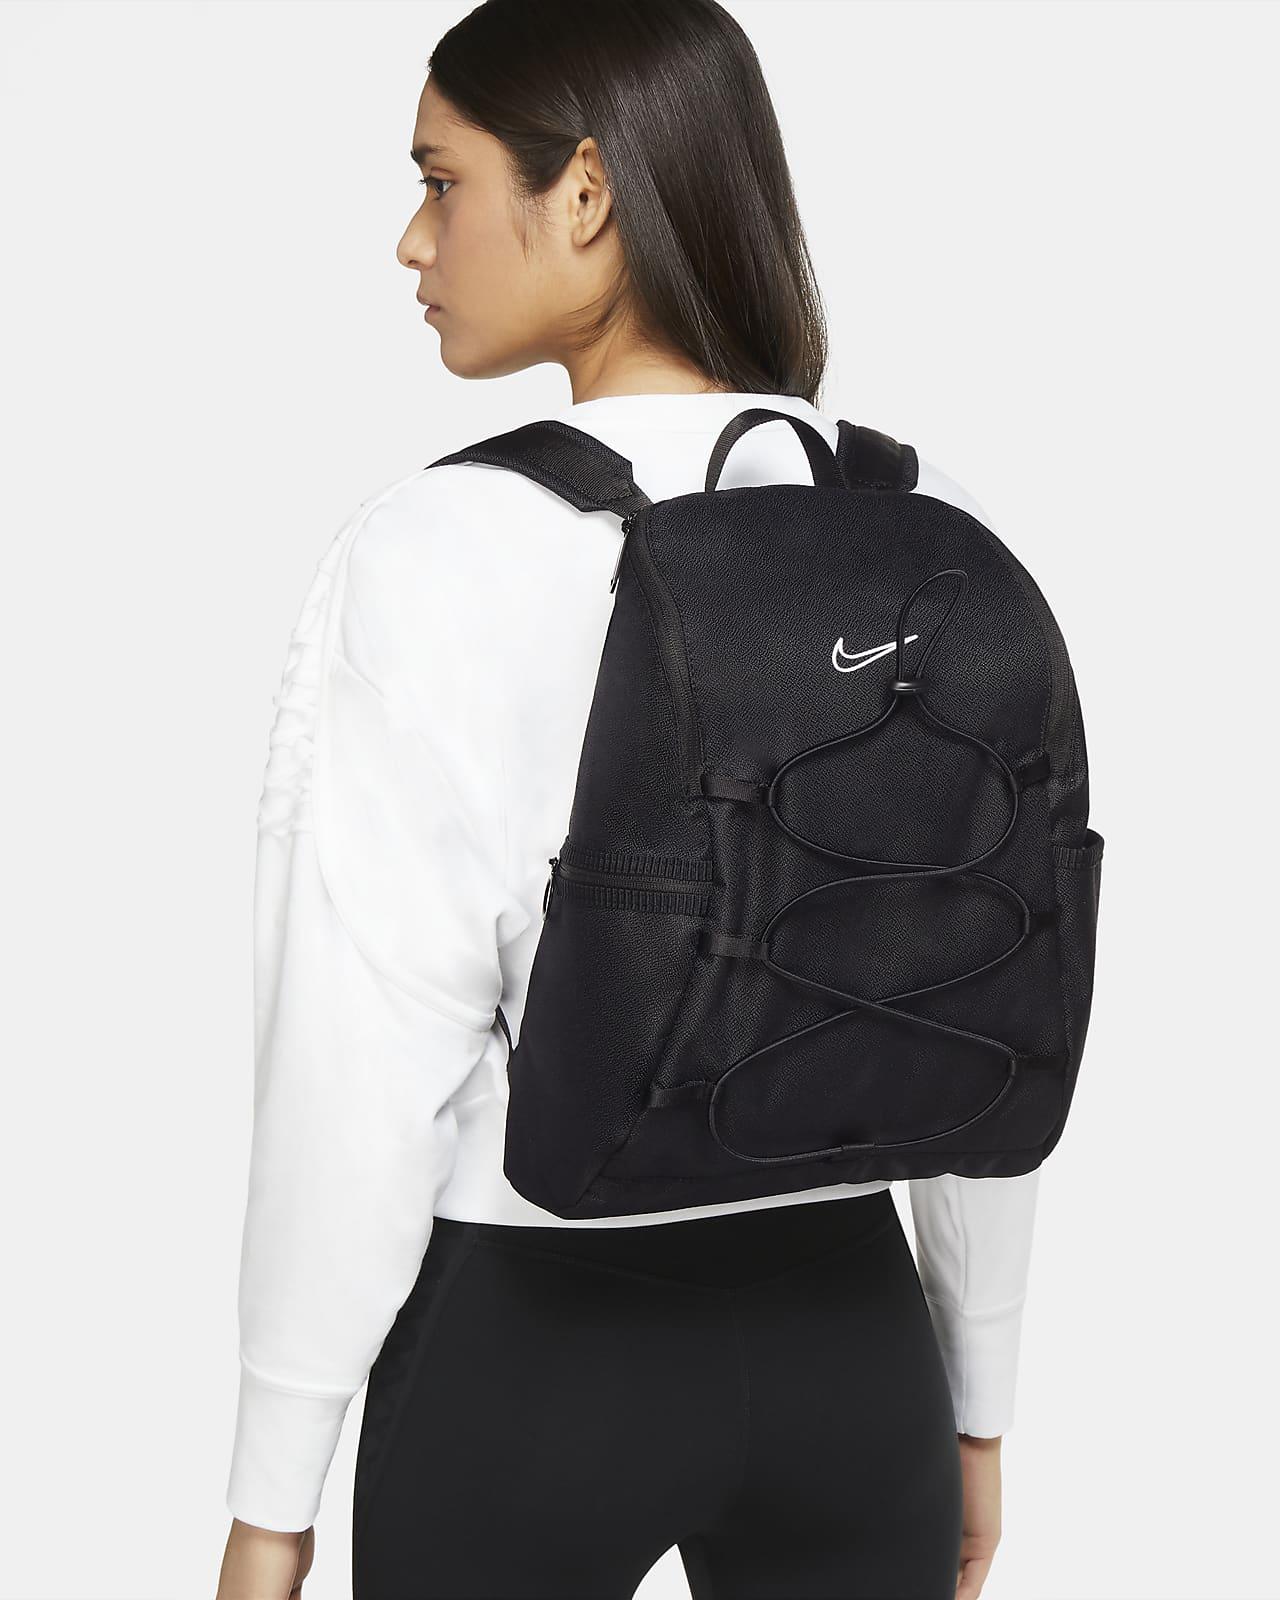 Nike One Women's Training Backpack